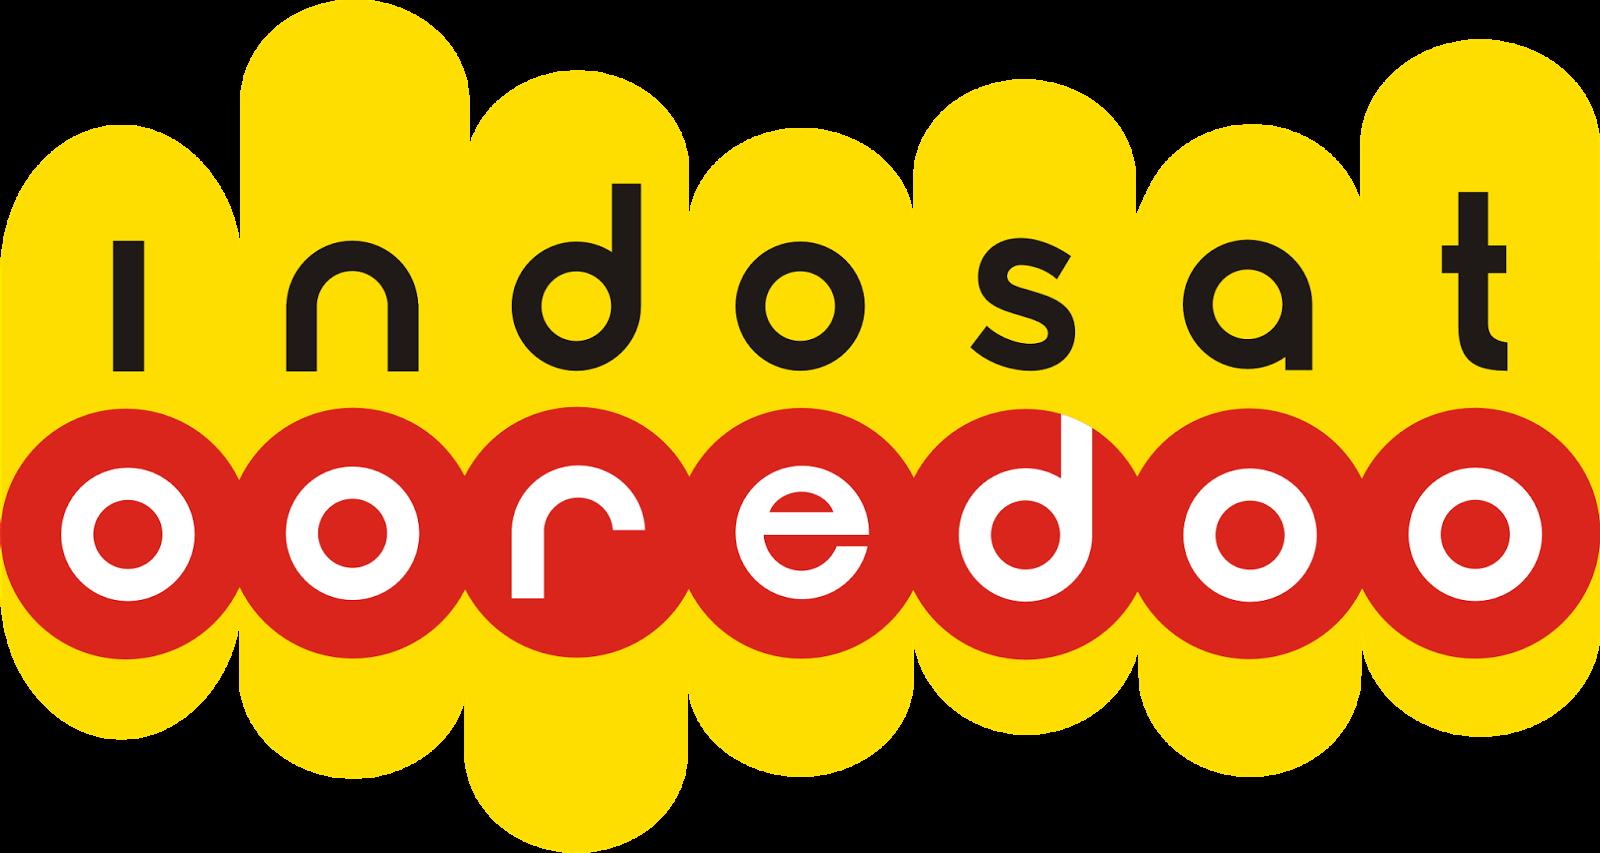 logo baru indosat 2015